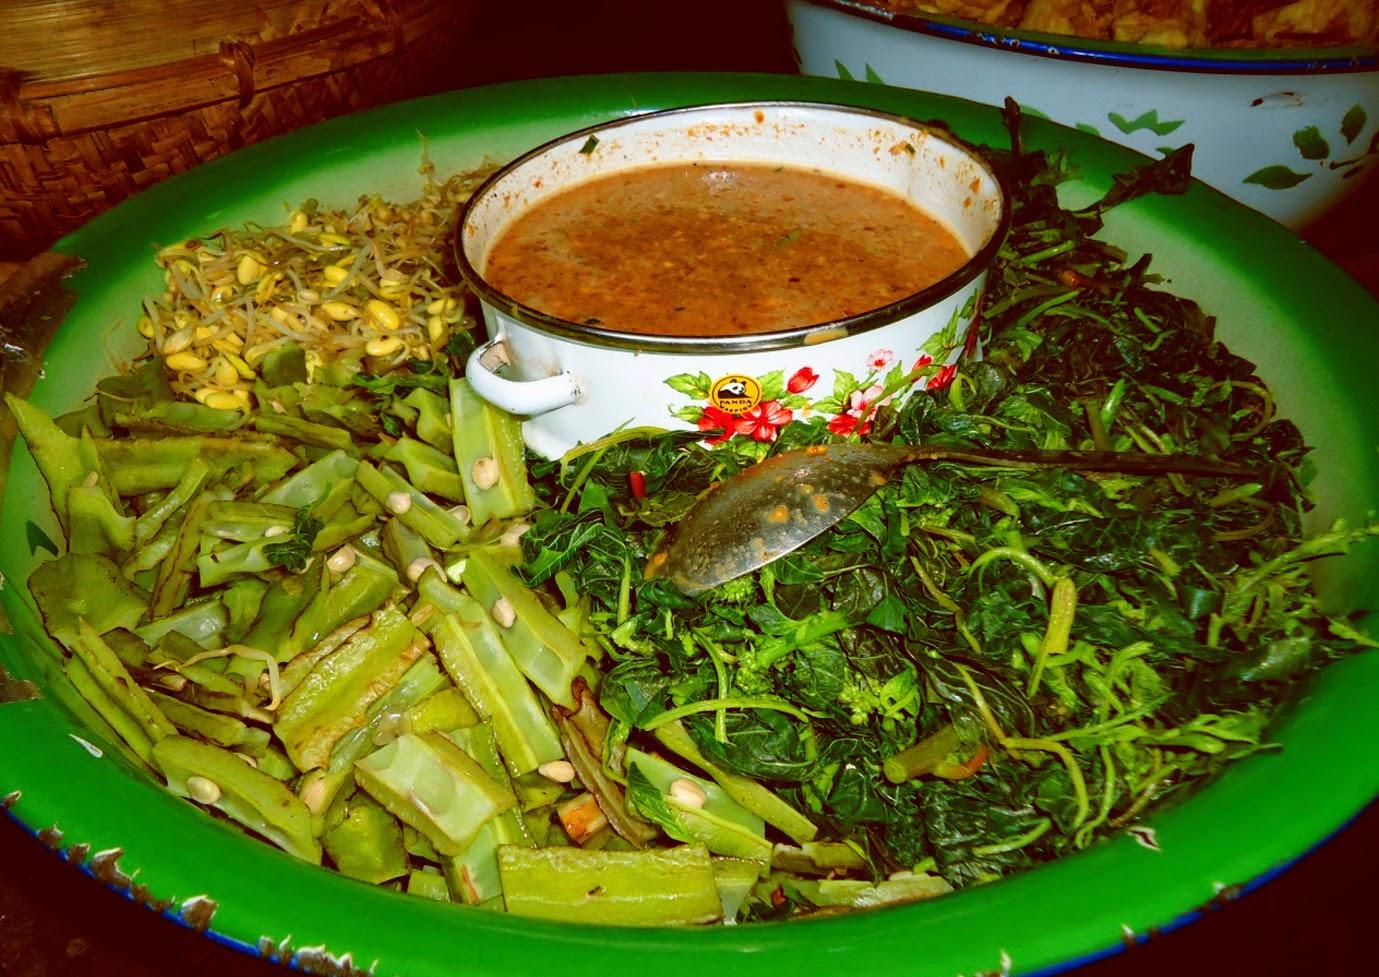 Revolusi Ilmiah - Makanan lokal nusantara